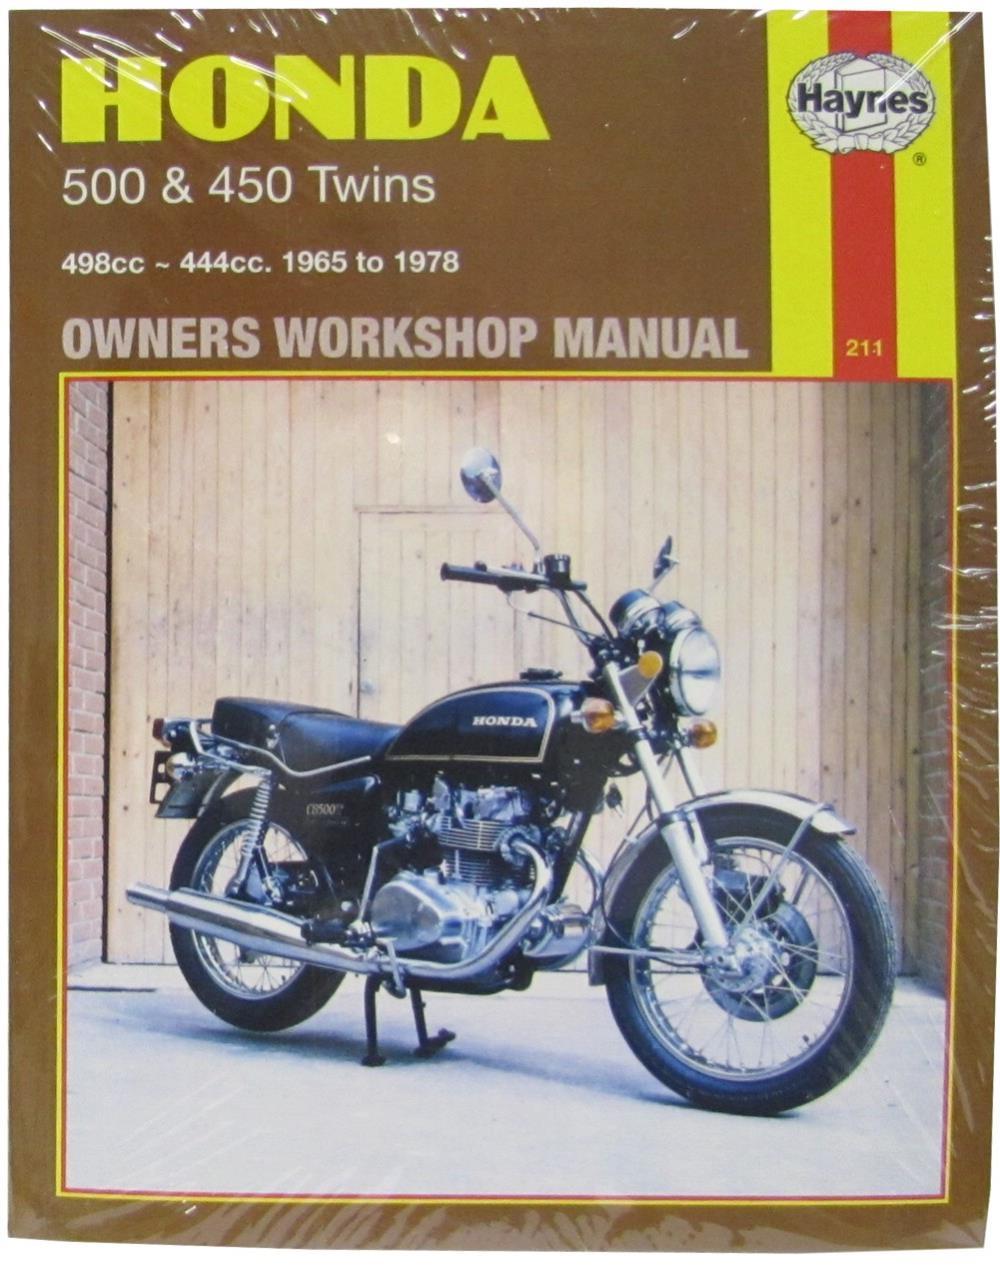 Astonishing Workshop Manual Honda Cb500 450 Twins Ebay Wiring 101 Breceaxxcnl